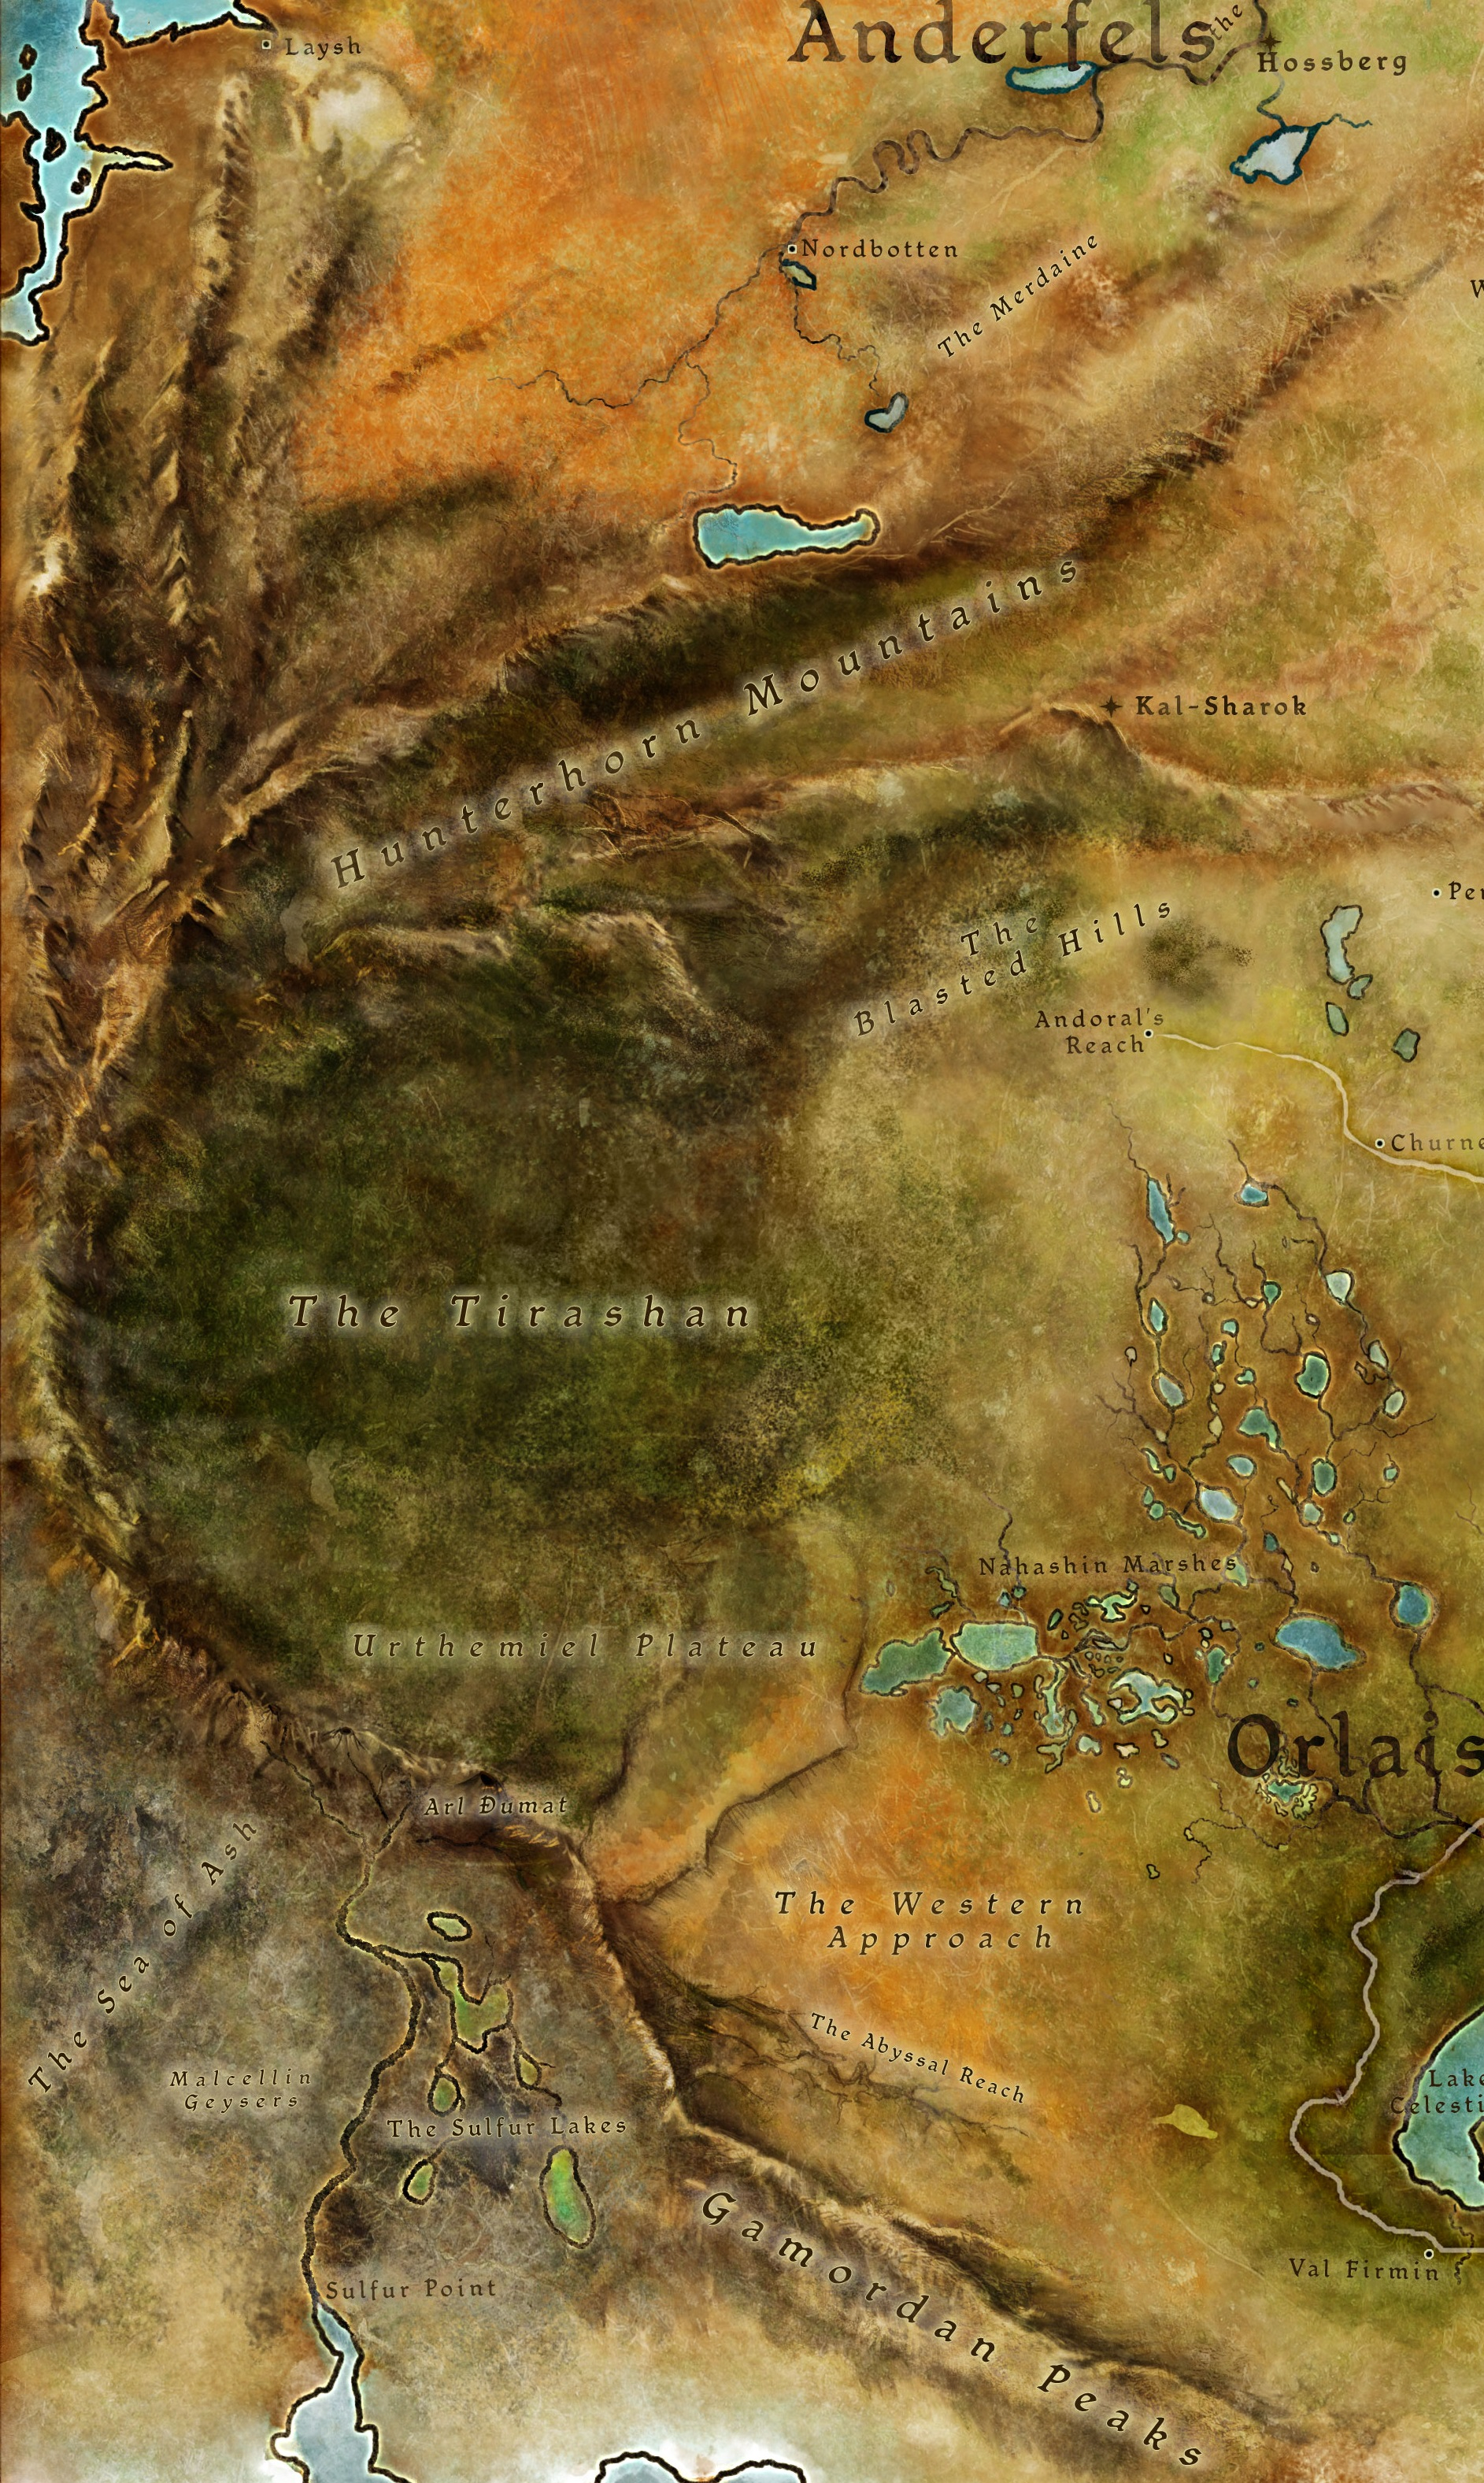 Hunterhorn Mountains map image.jpg